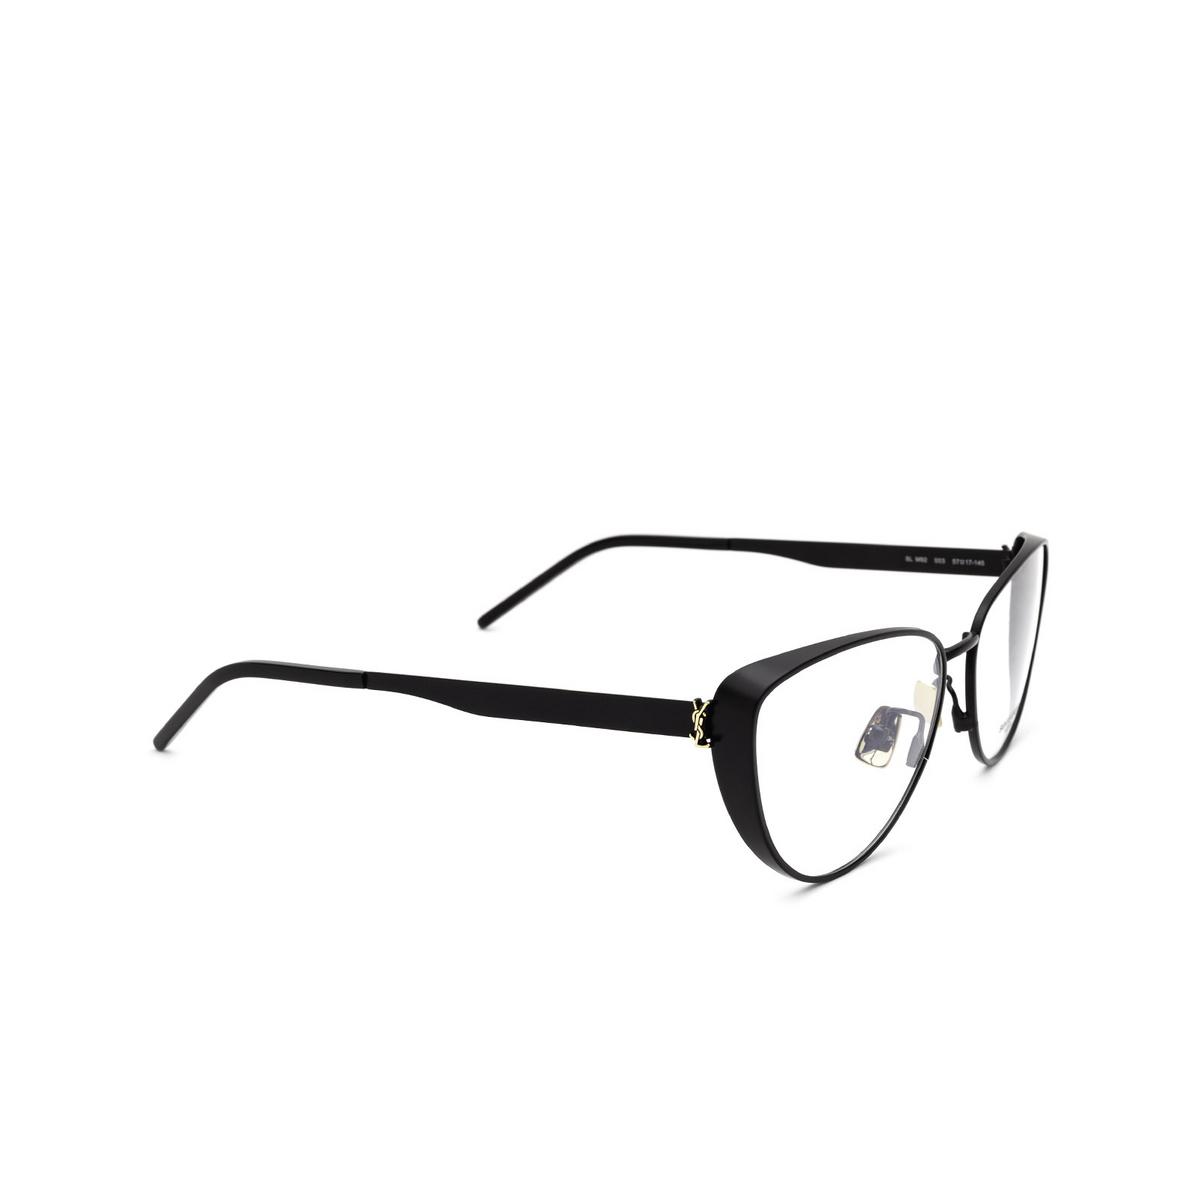 Saint Laurent® Cat-eye Eyeglasses: SL M92 color Black 003 - three-quarters view.